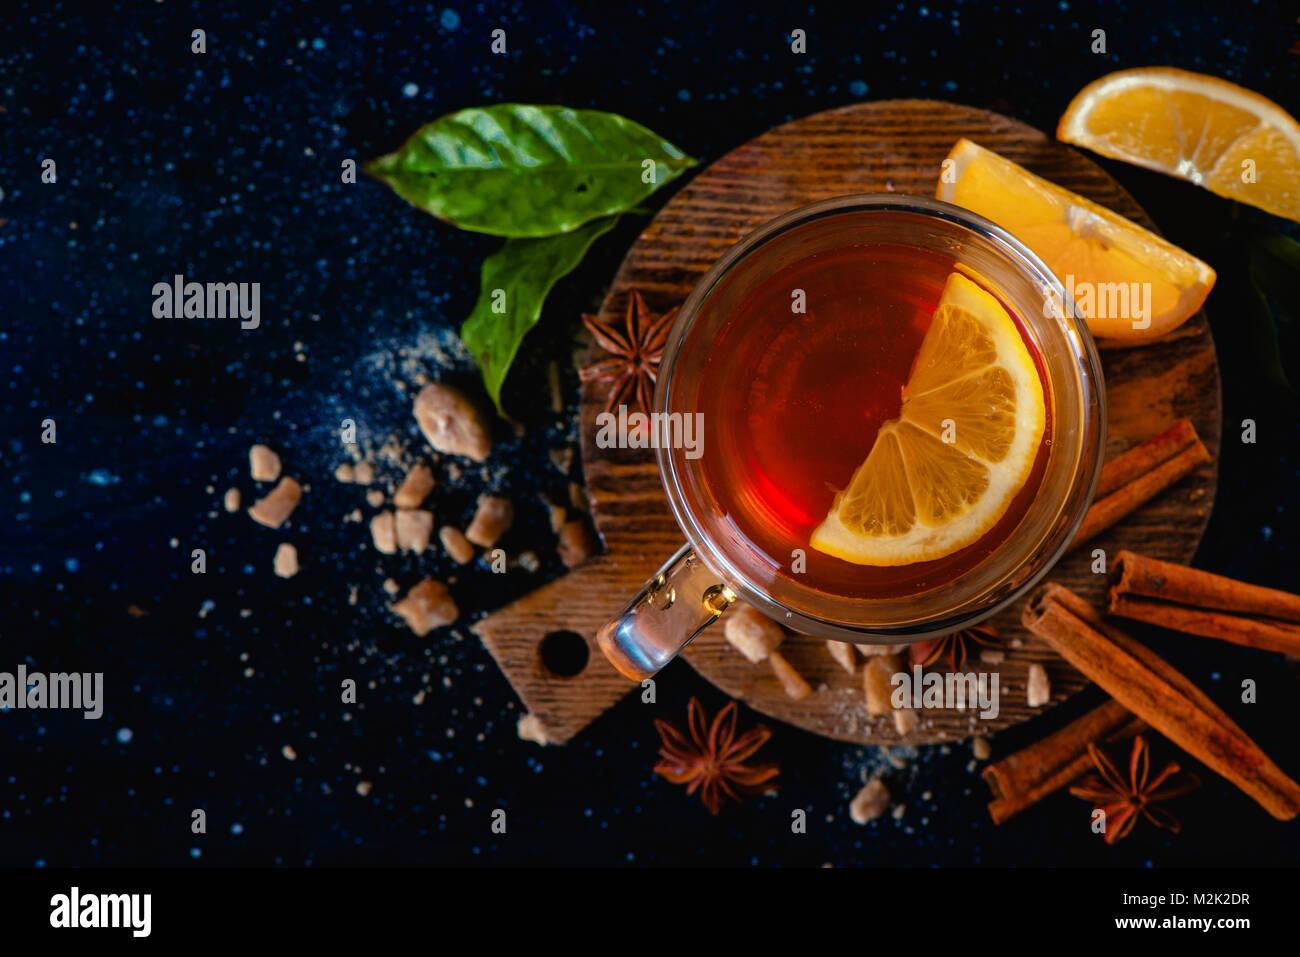 Dark still life with a teacup, lemon slices, anise stars, sugar, tea leaves and cinnamon on a dark background. Autumn - Stock Image